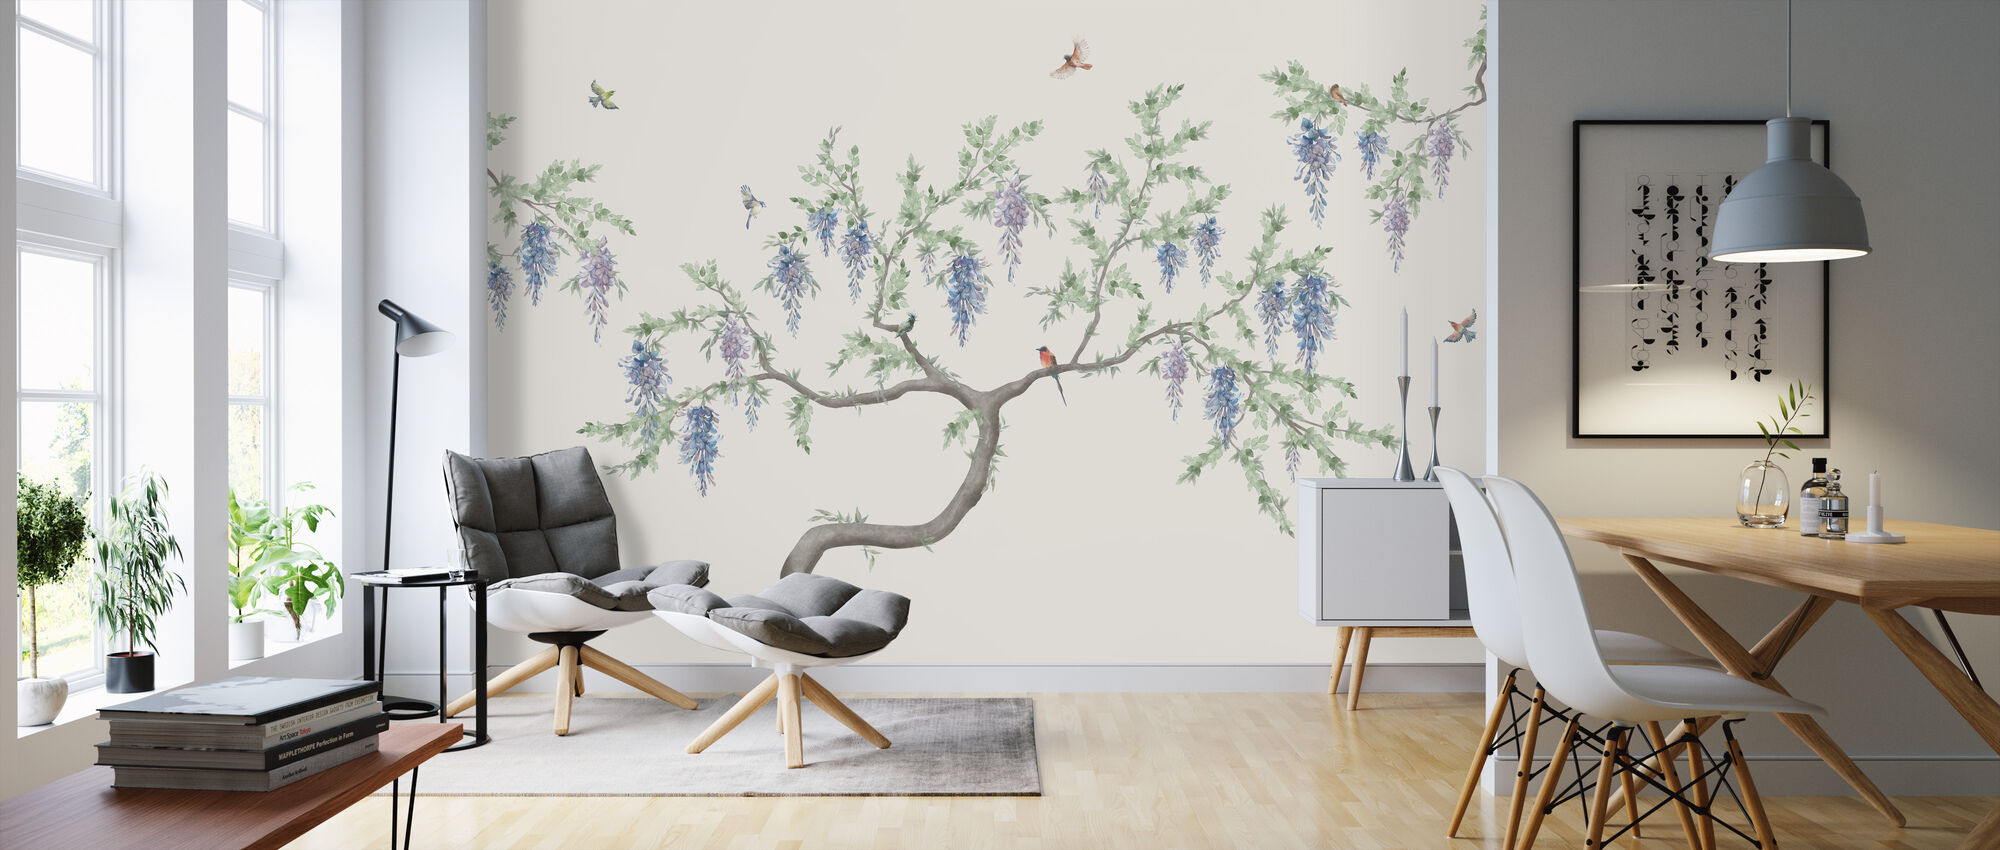 Ineffable Tree - Natur - Wallpaper - Living Room